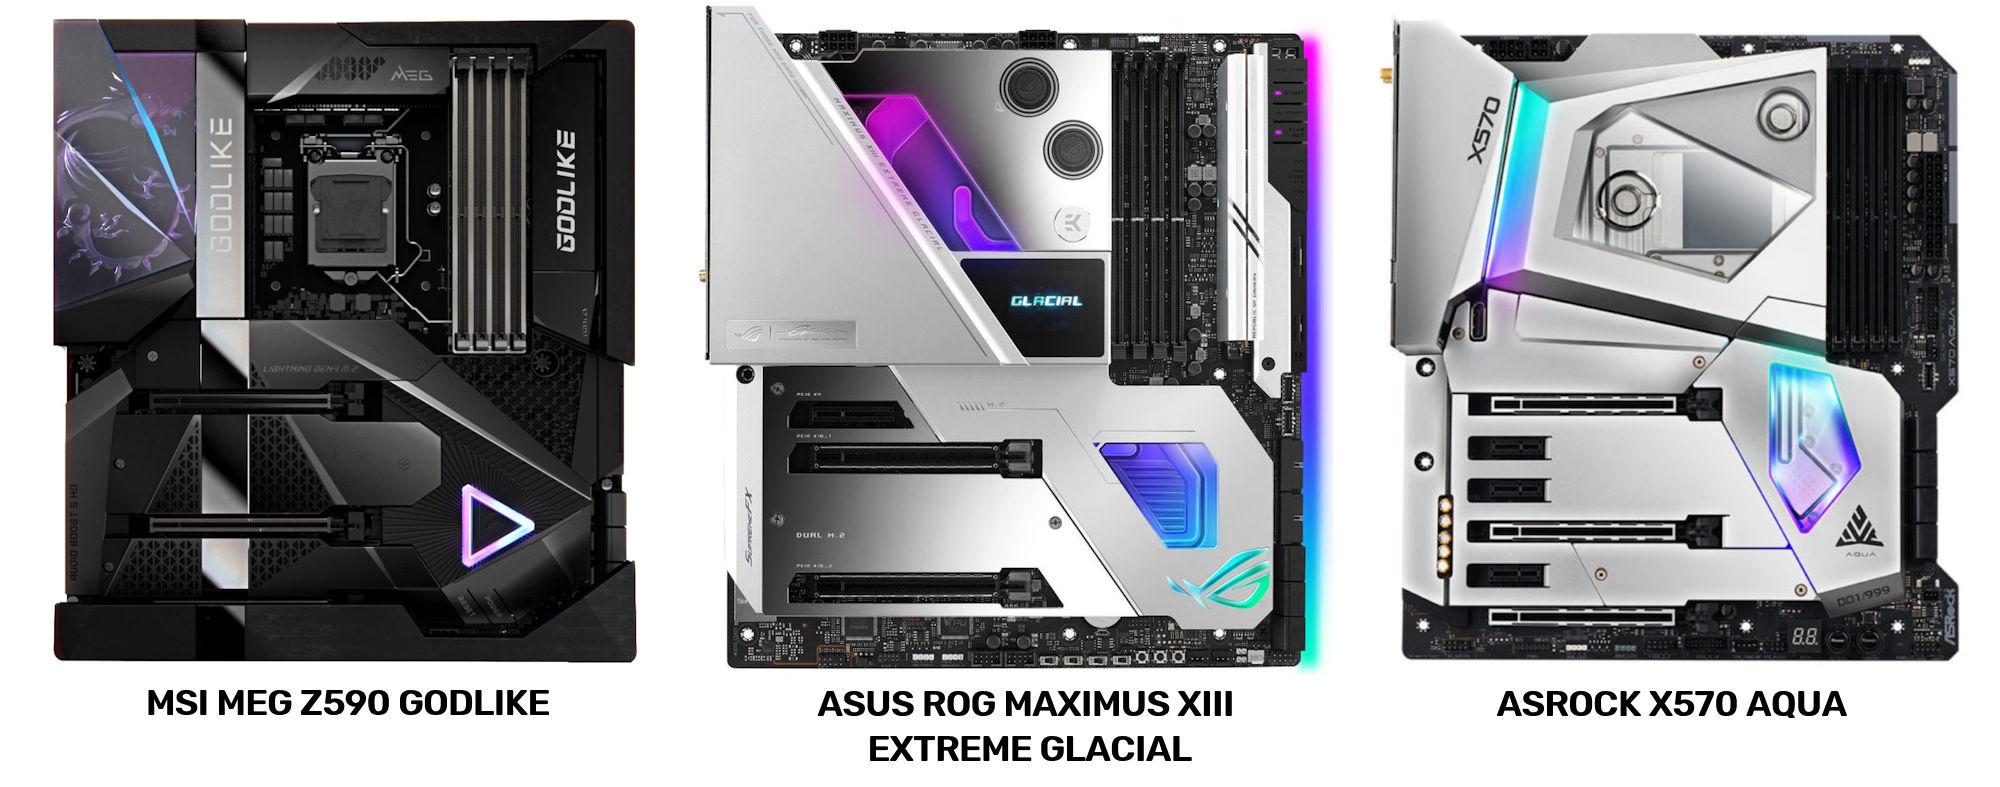 ASRock X570 AQUA vs Asus ROG Maximus XIII Extreme Glacial vs MSI MEG Z590 GOLDLIKE 0